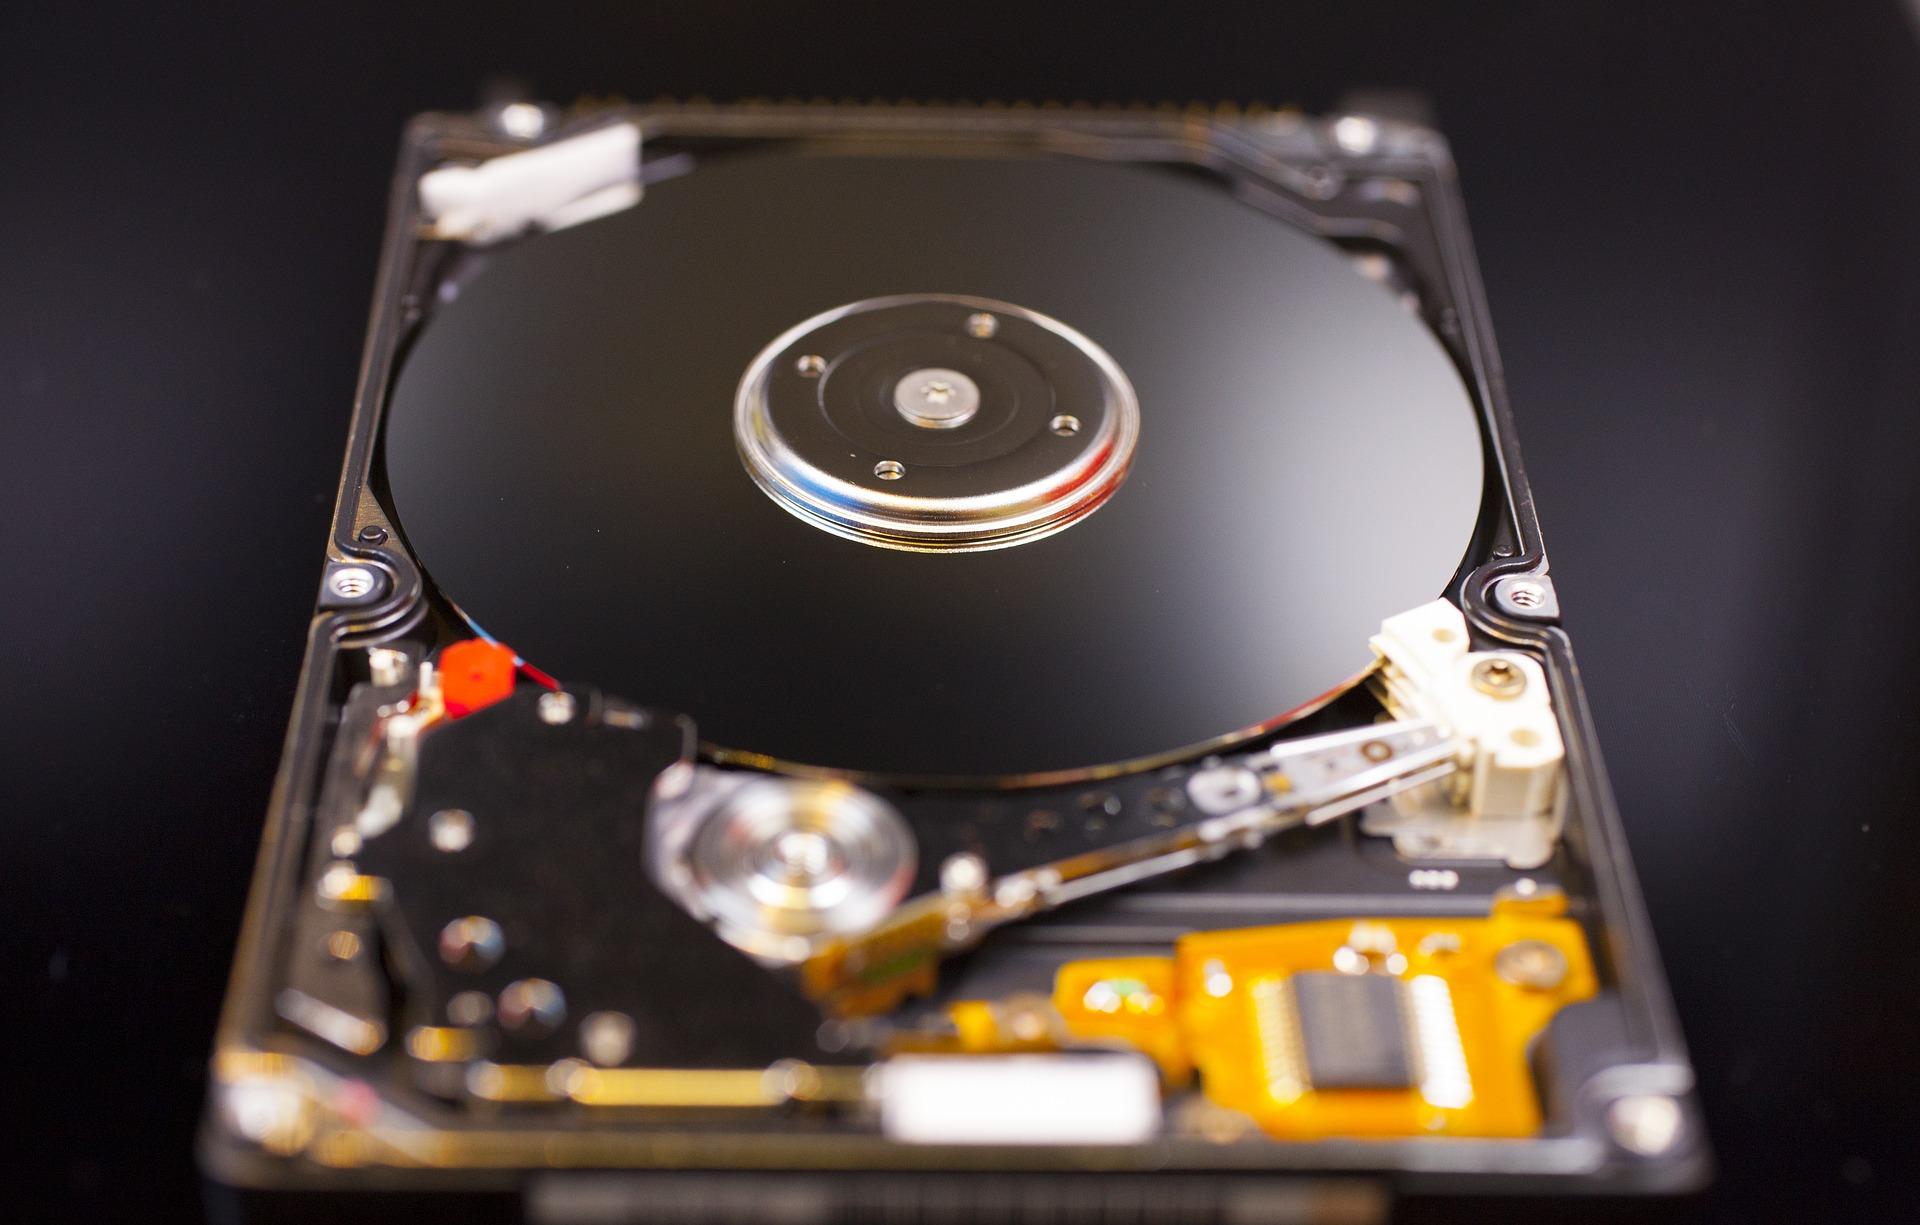 hard-disk-2403384_1920.jpg